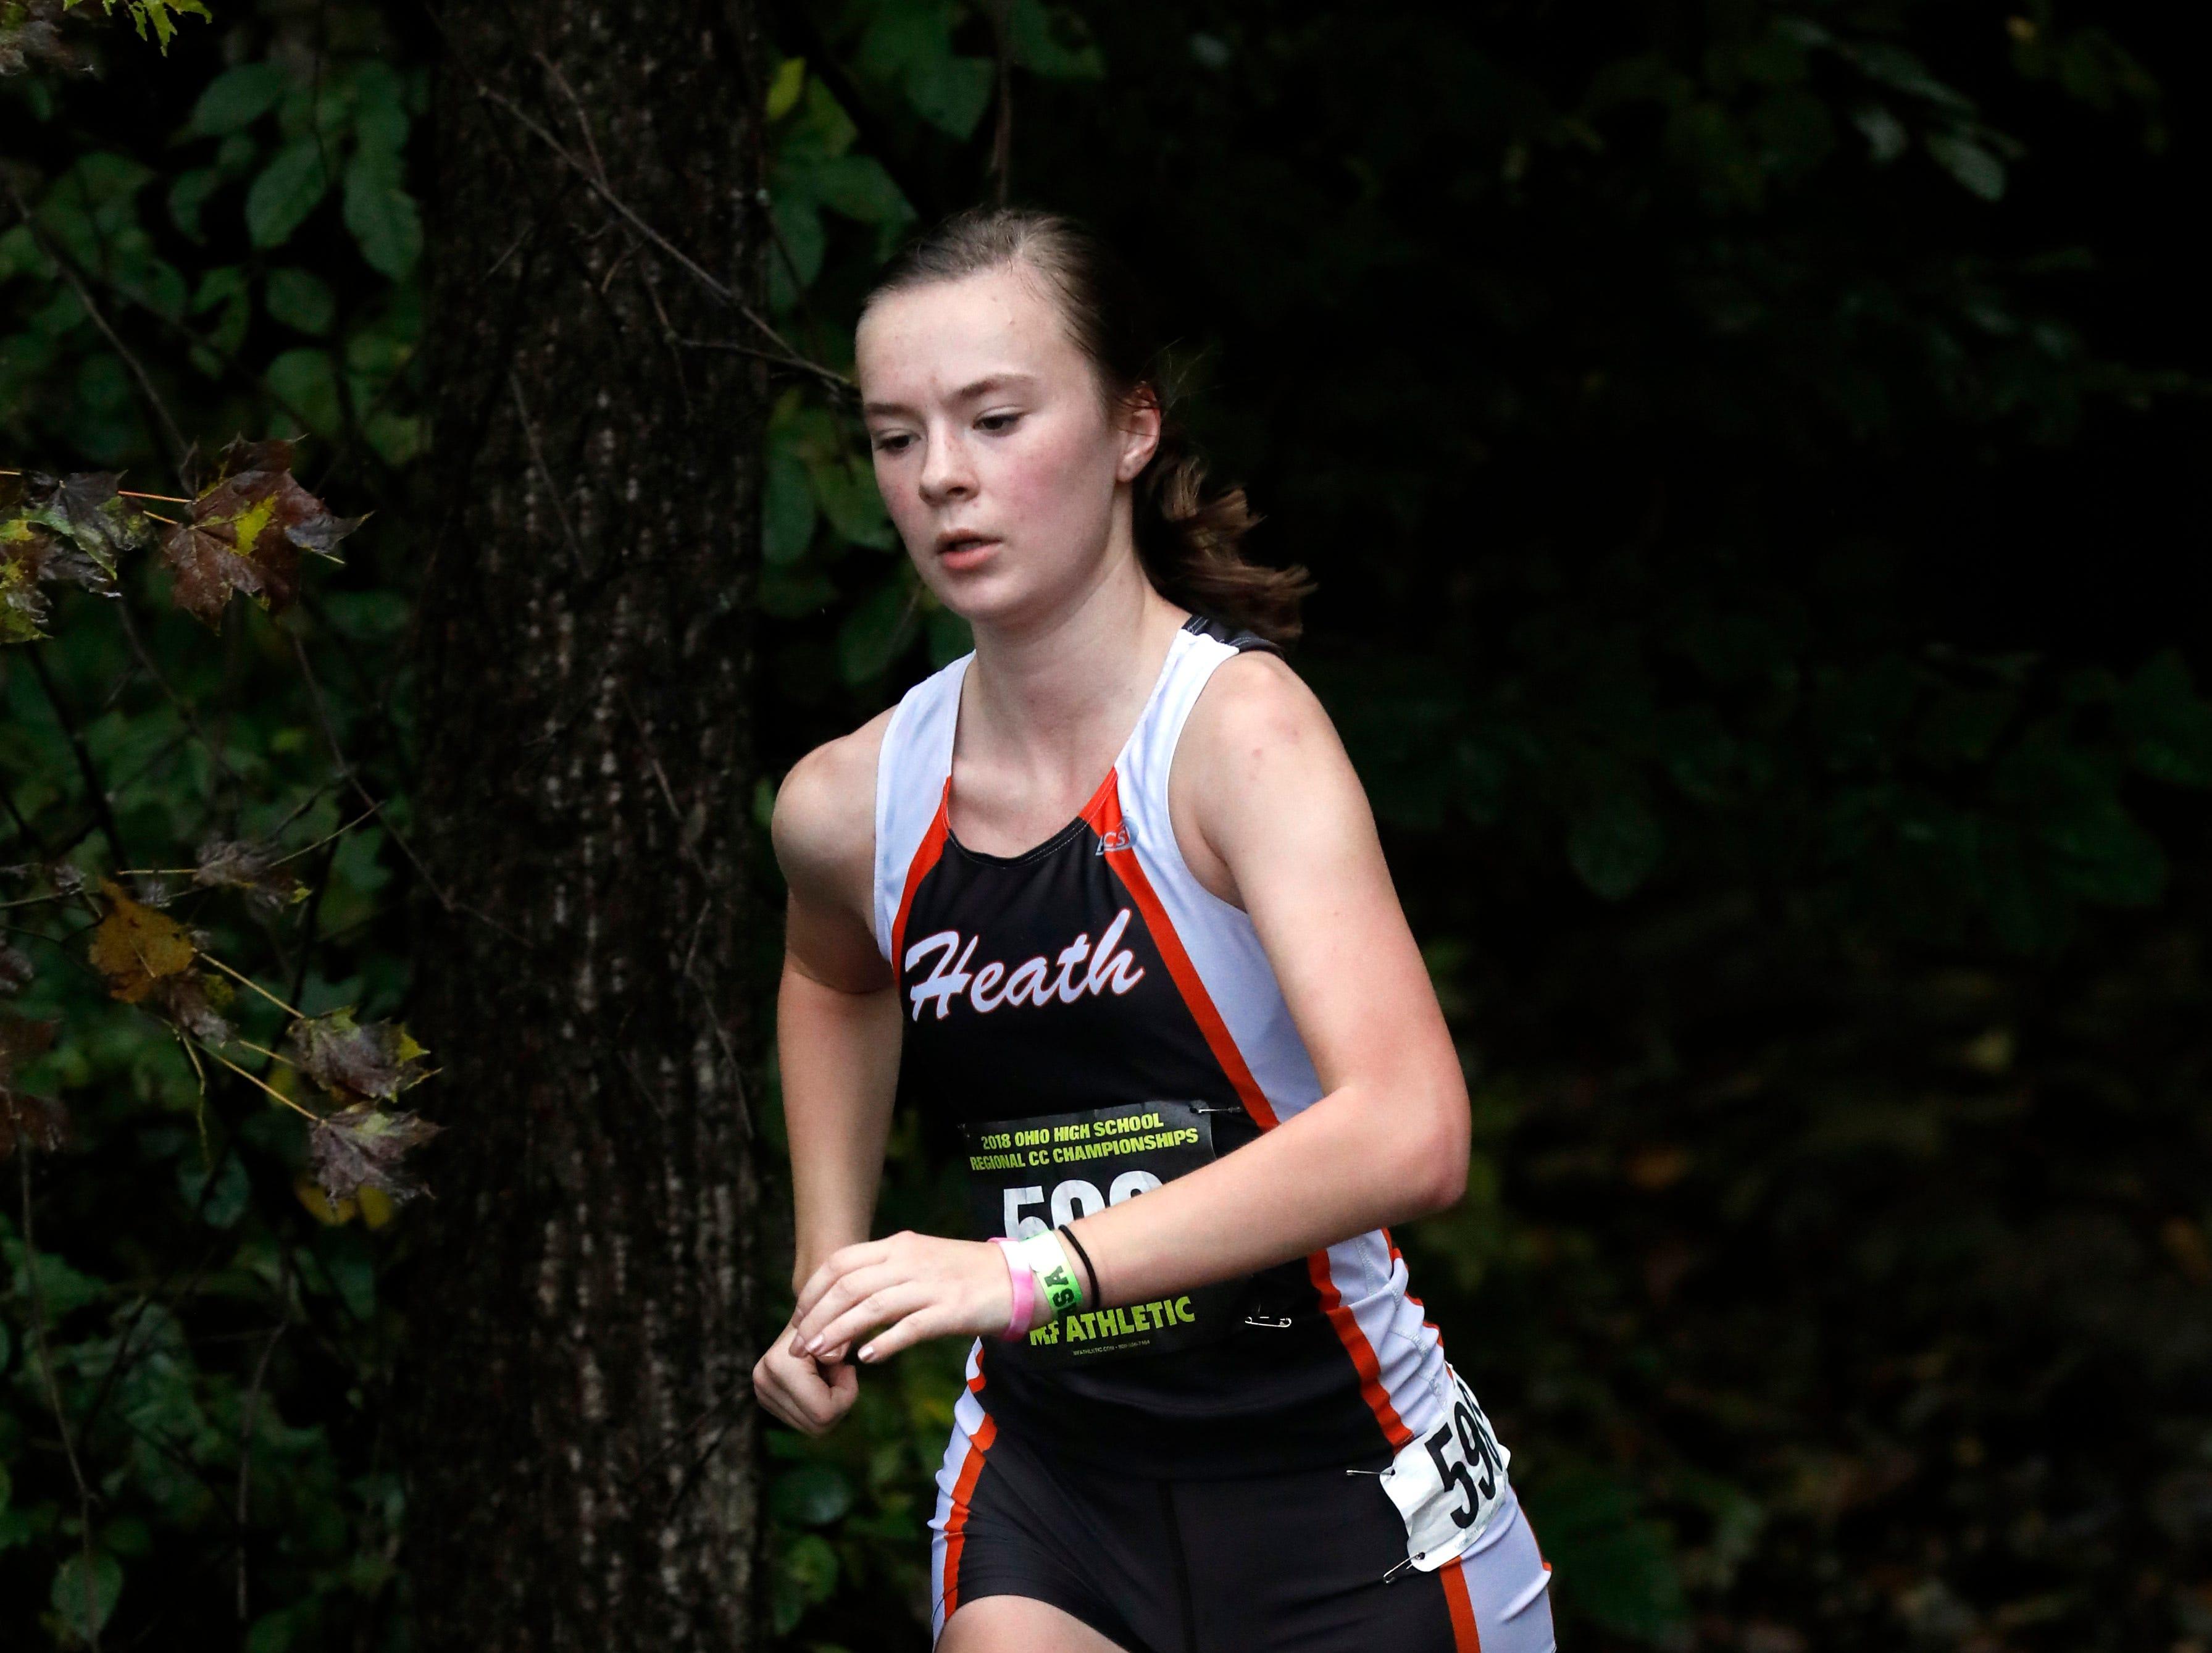 Heath's Rory Bridges runs in the Regional Cross Country meet Saturday, Oct. 27, 2018, at Pickerington North High School in Pickerington.